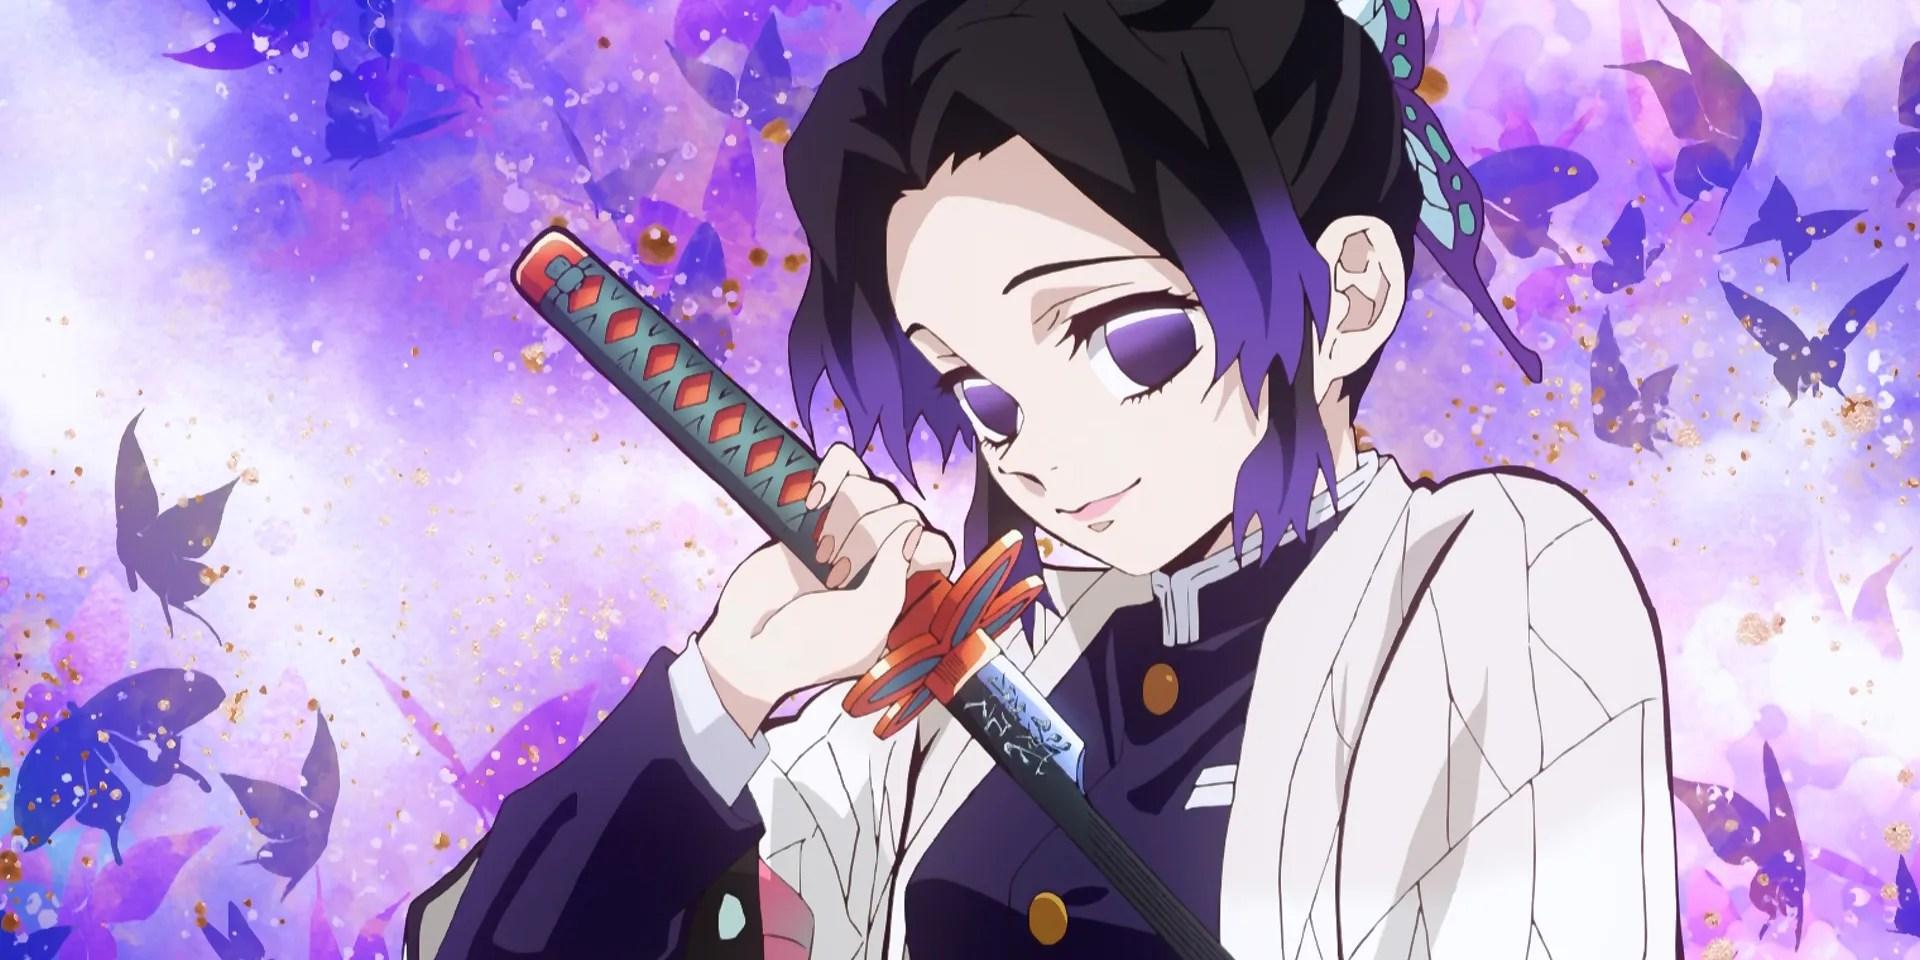 Become the blade that destroys demons! Demon Slayer: Kimetsu No Yaiba Just Introduced a New Way ...